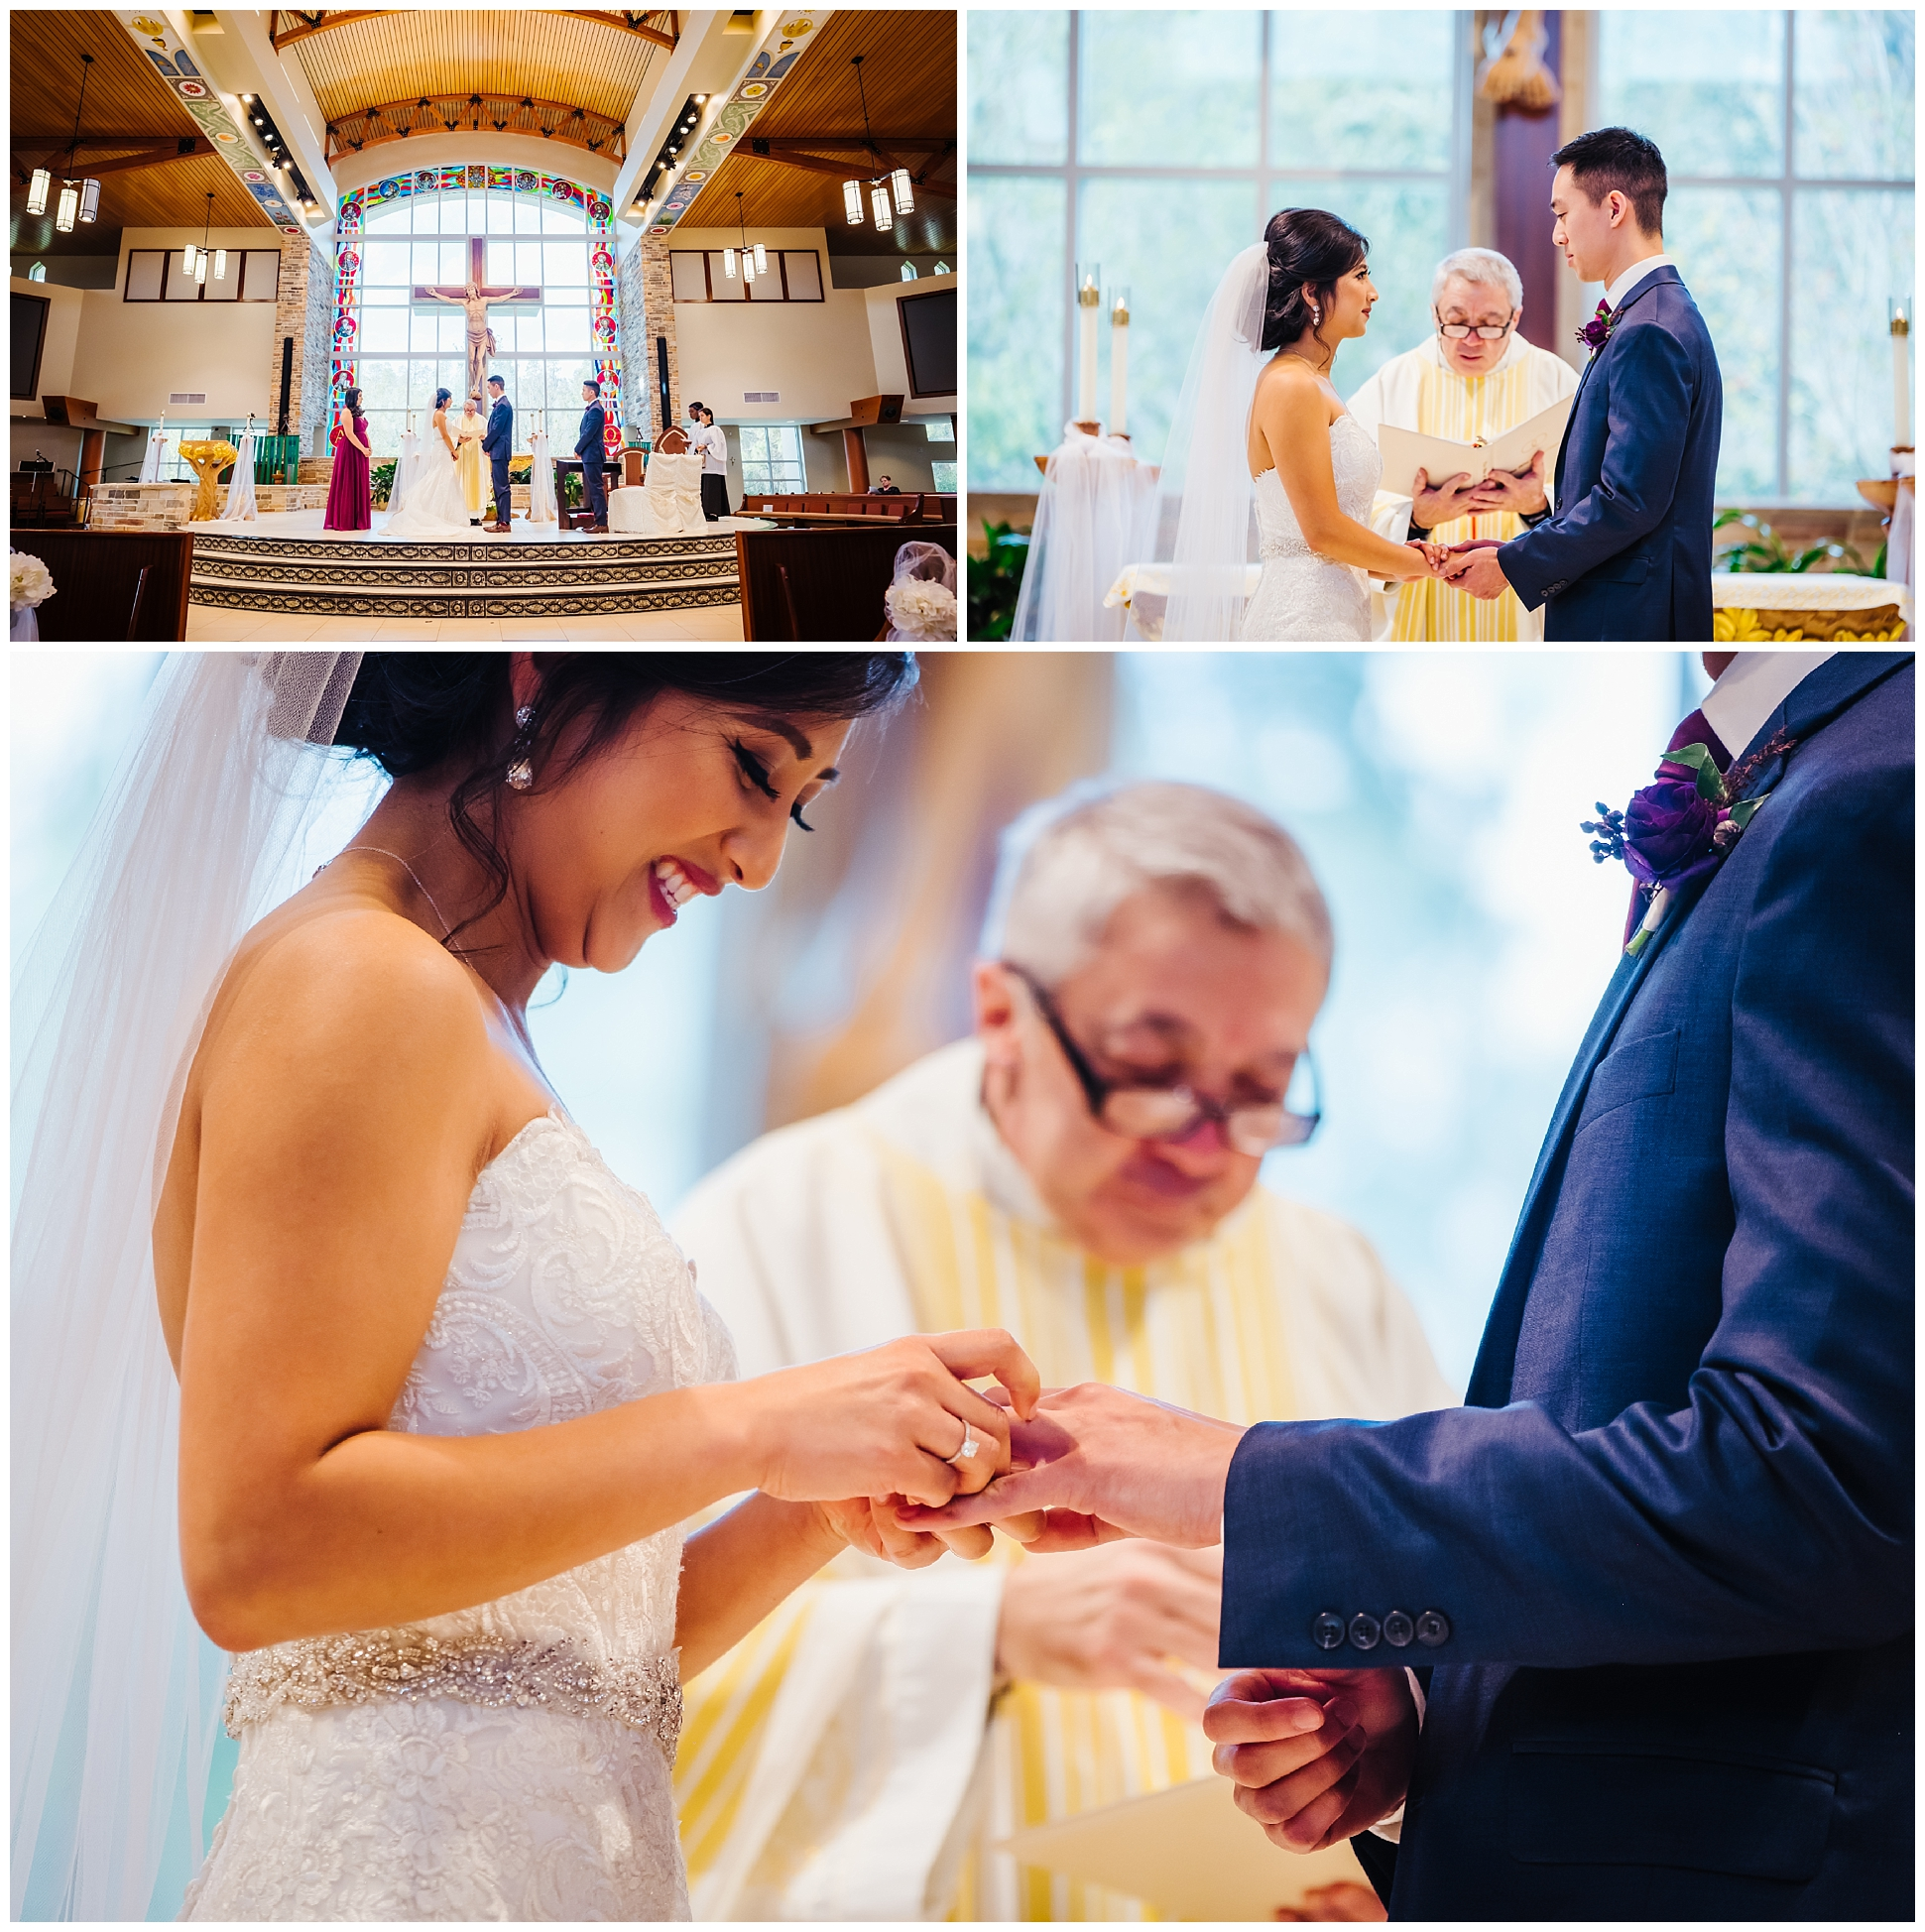 tampa-wedding-photographer-philipino-colorful-woods-ballroom-church-mass-confetti-fuscia_0035.jpg